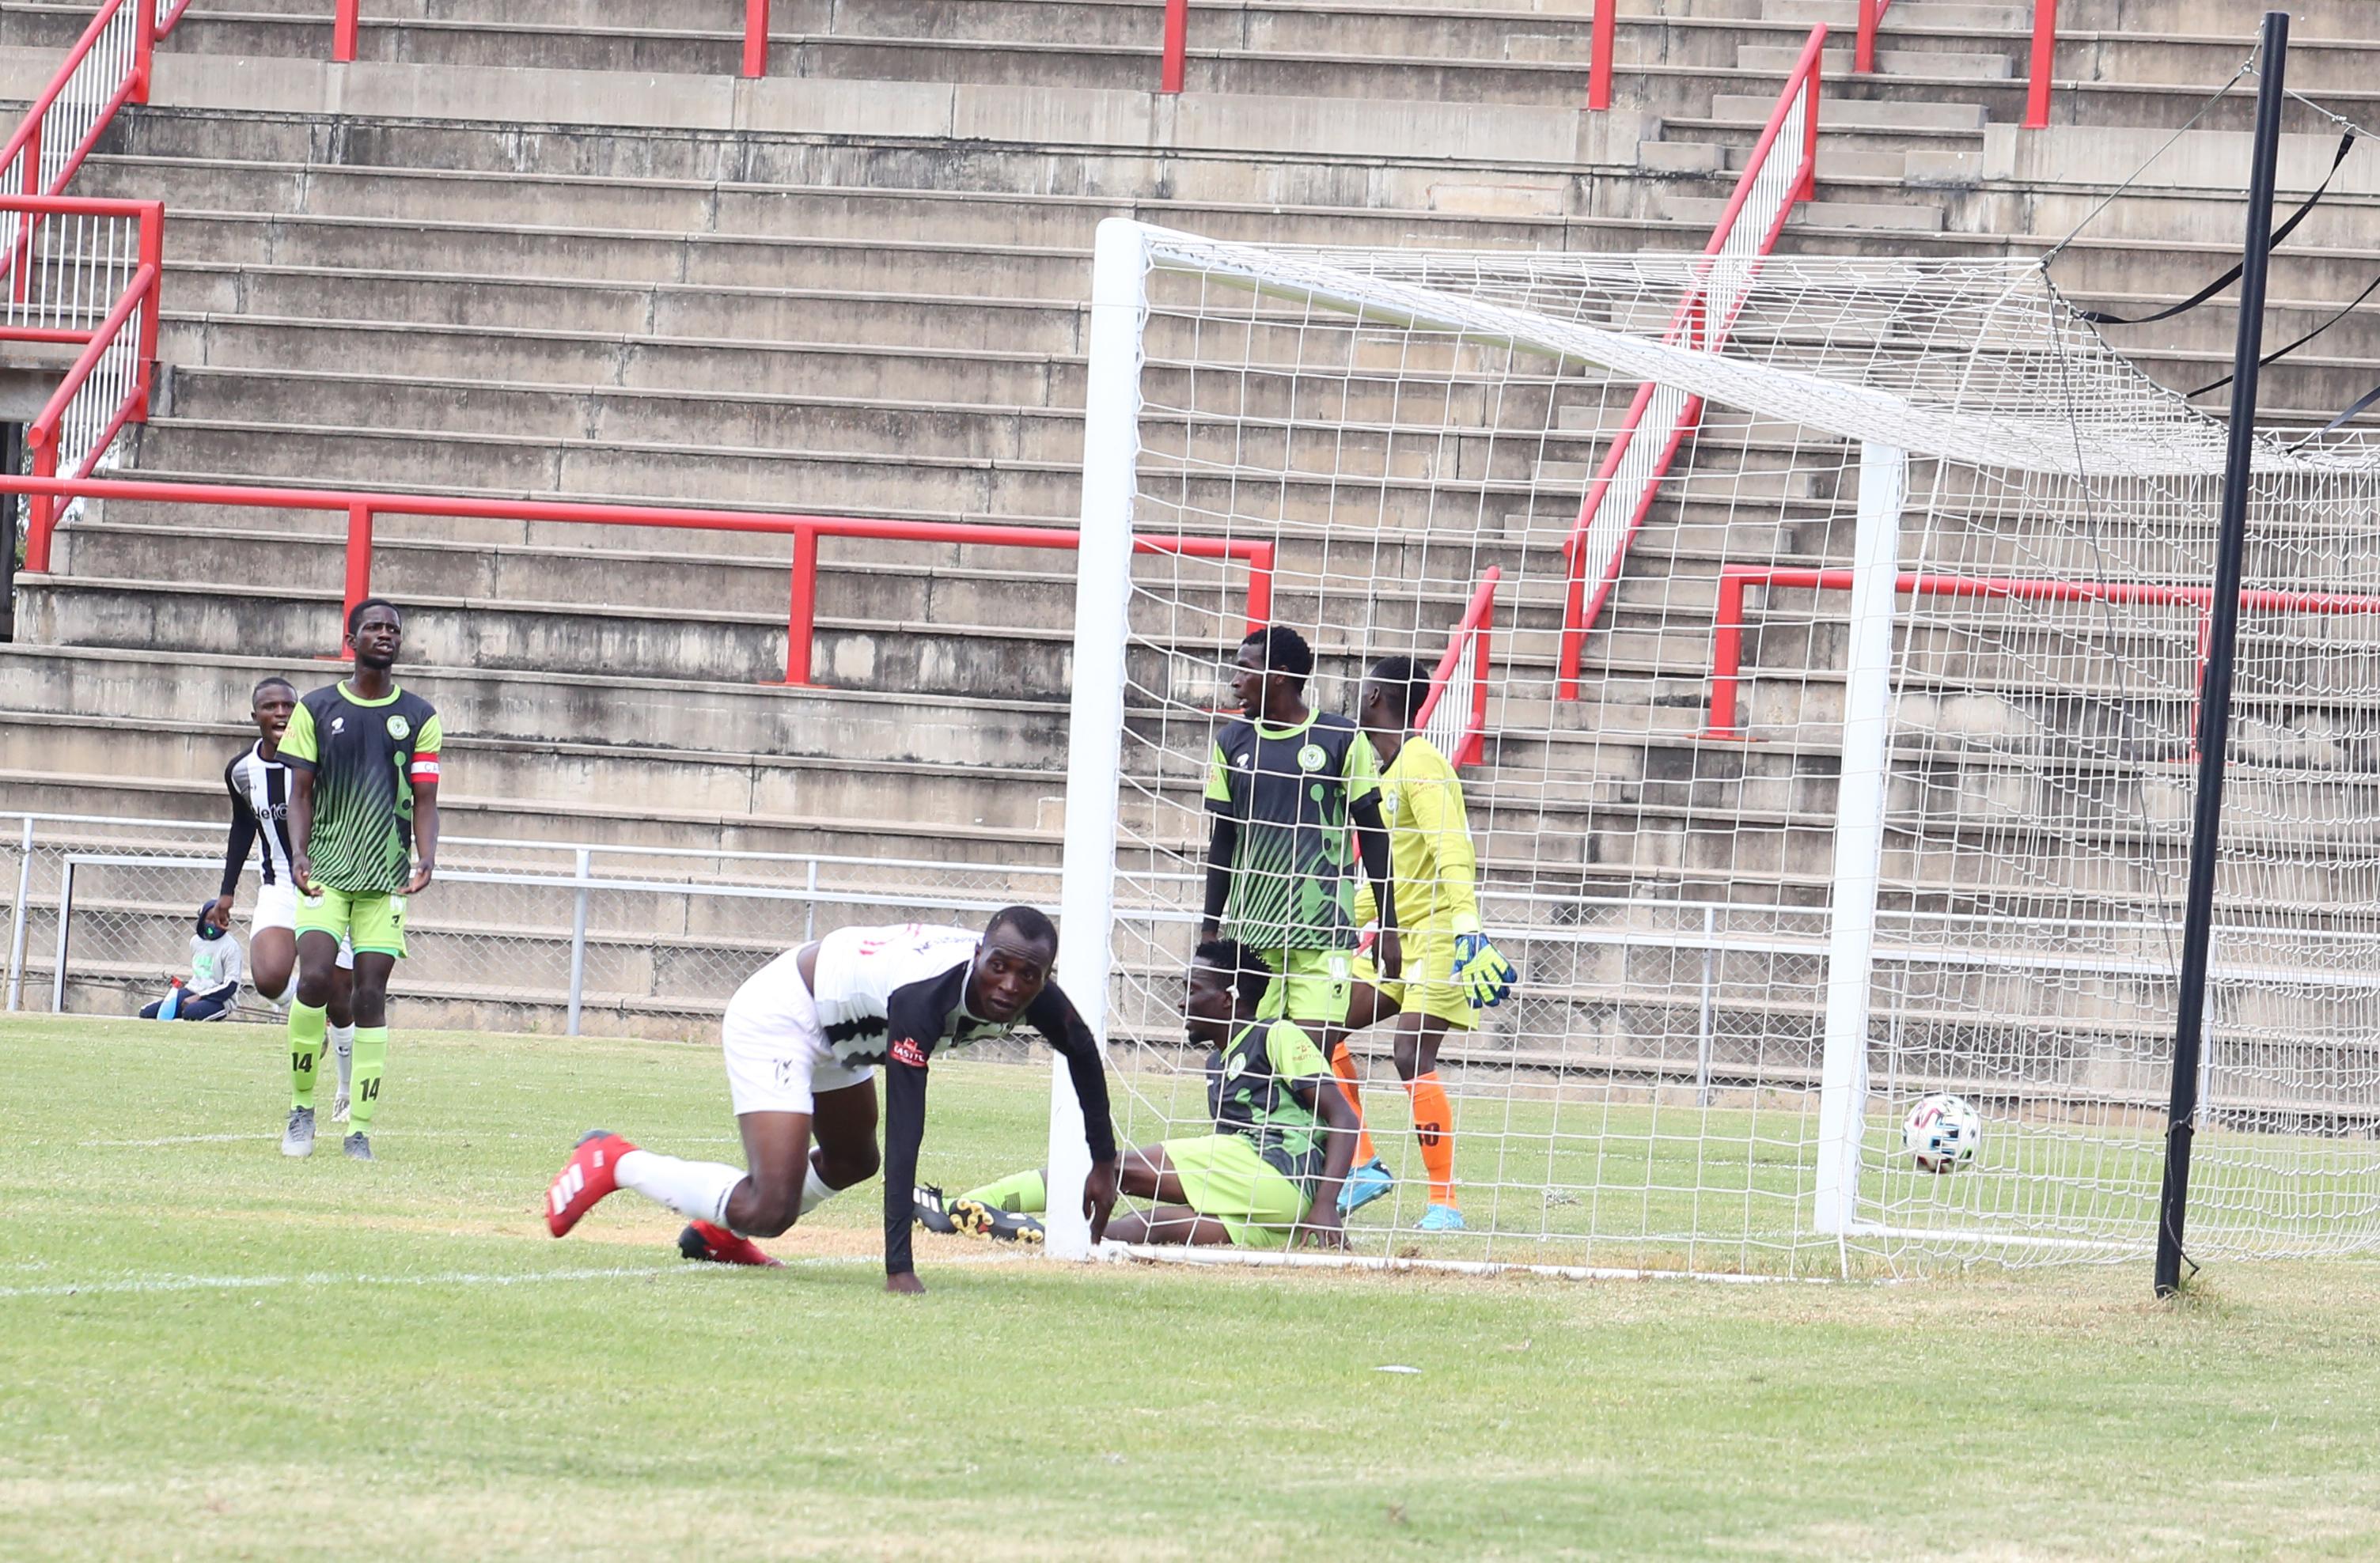 Navaya not carried away by debut goal